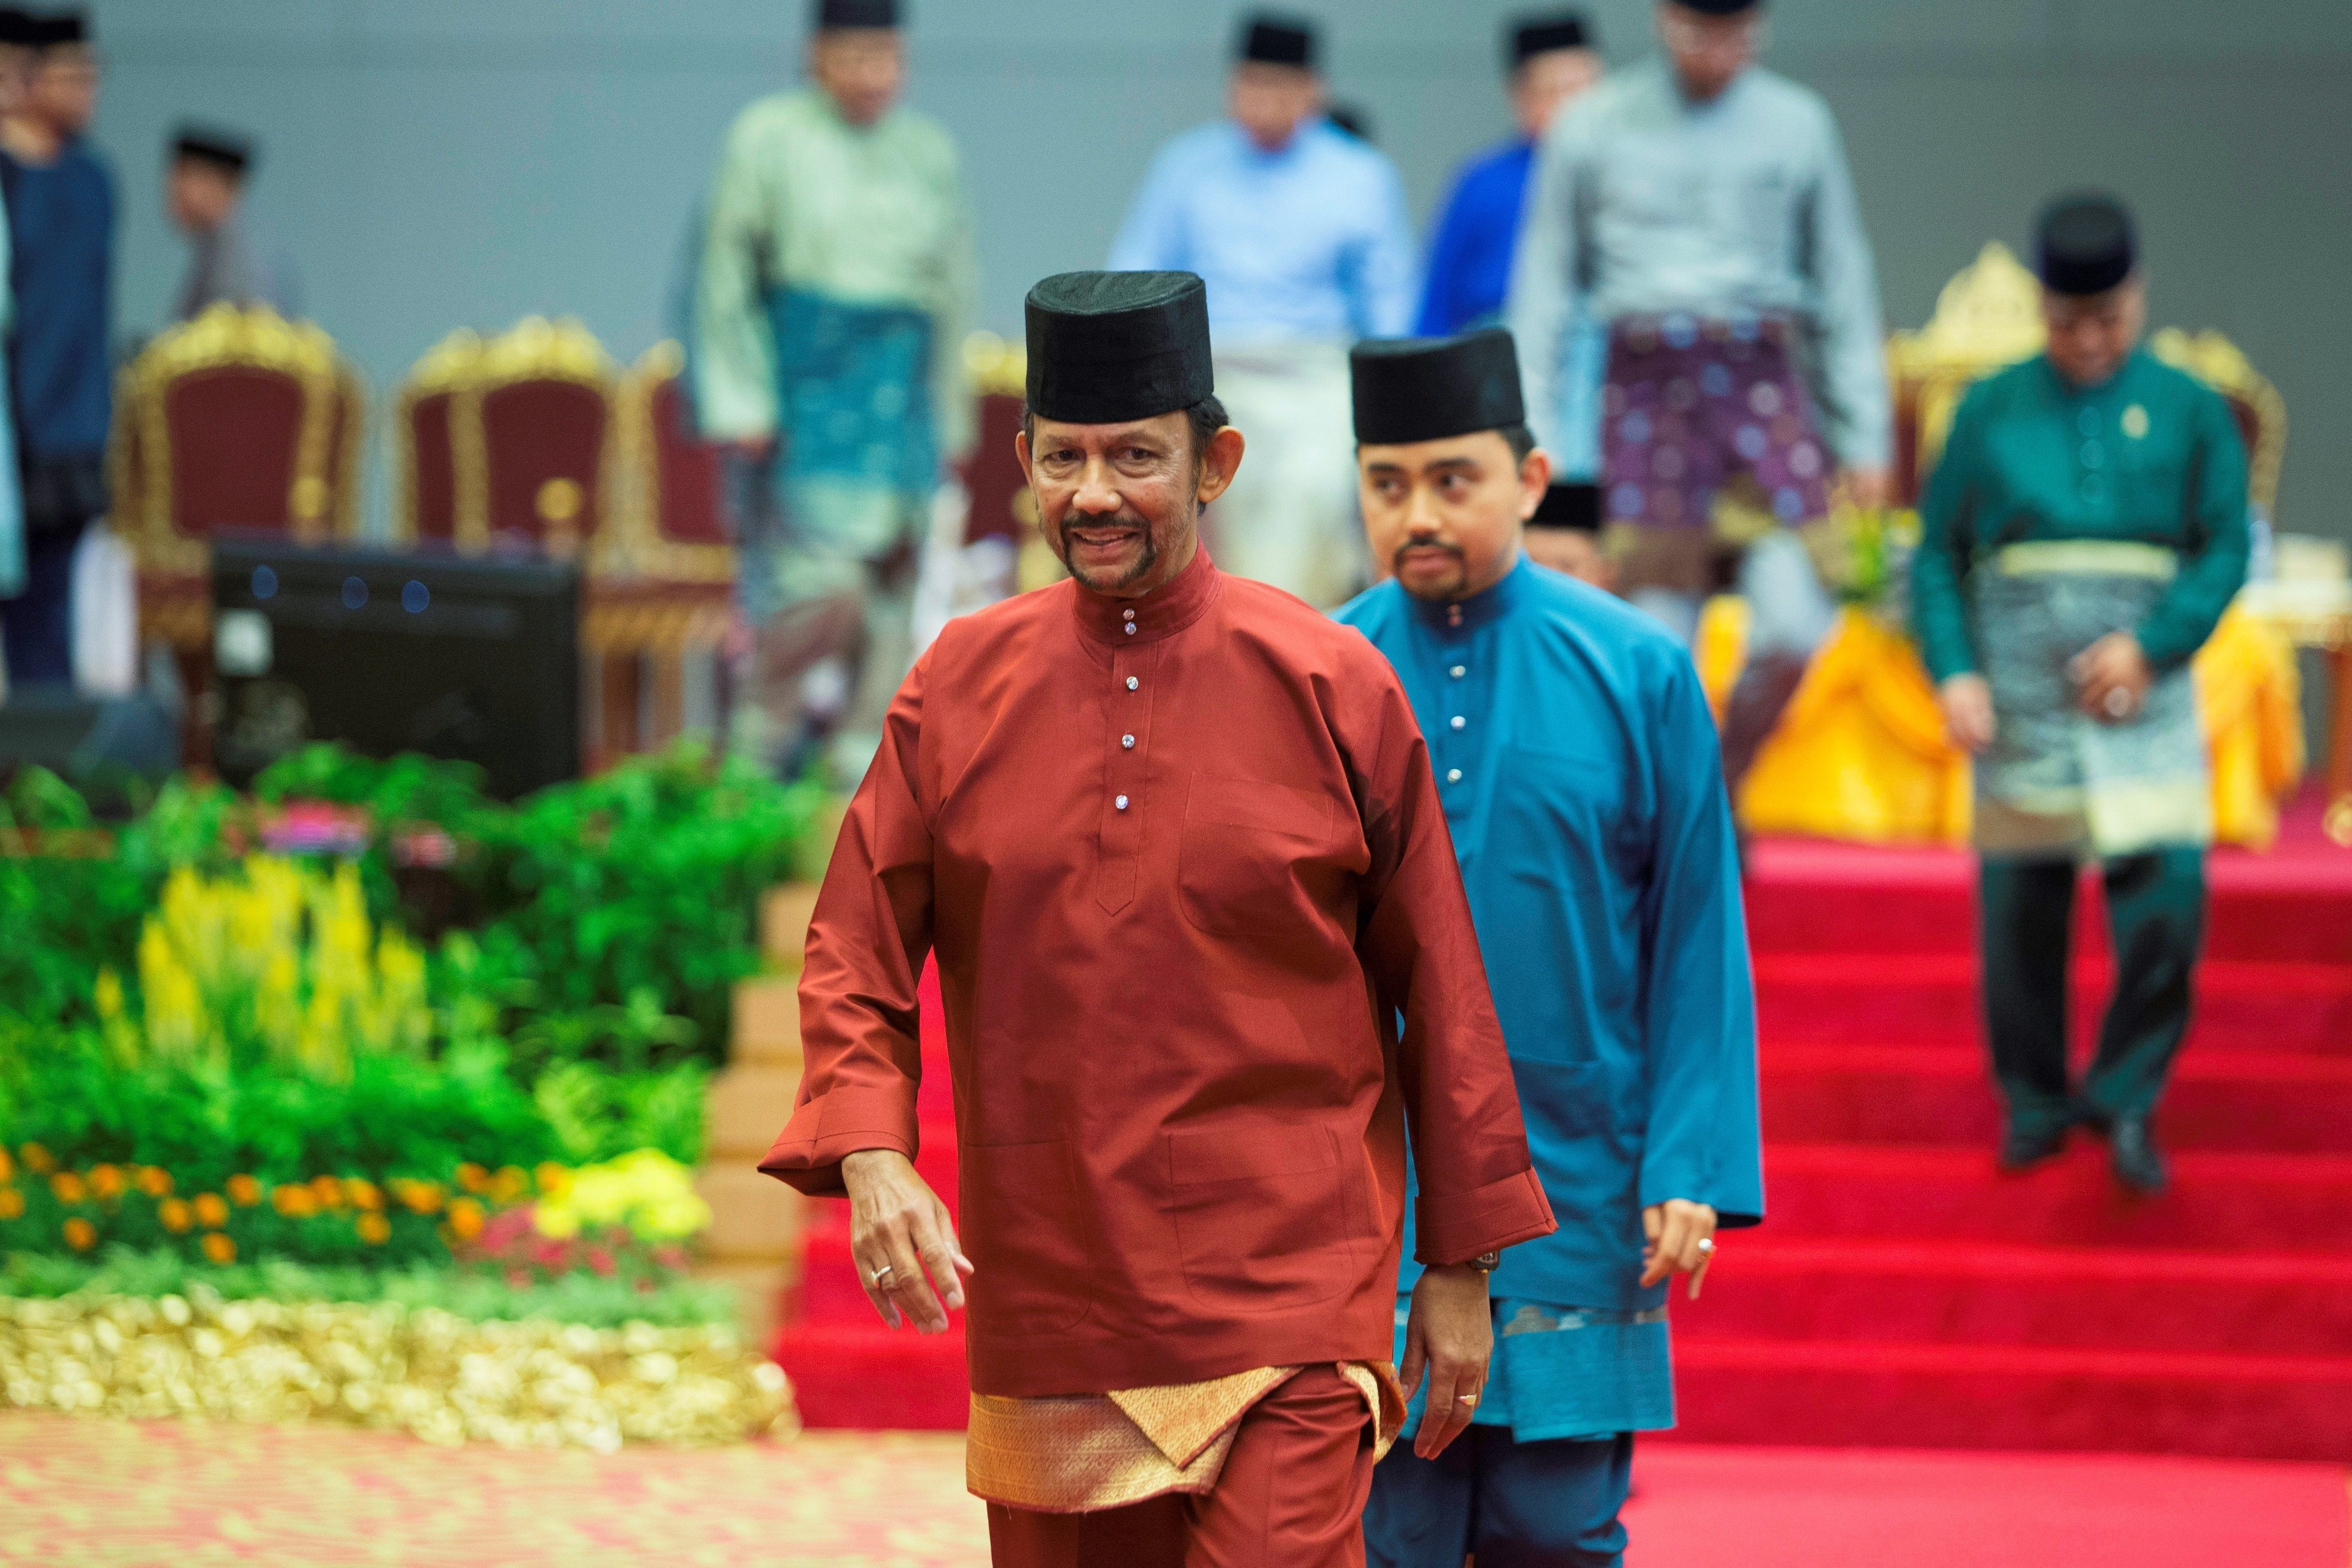 Brunei's Sultan Hassanal Bolkiah leaves after speaking at an event in Bandar Seri Begawan on 3